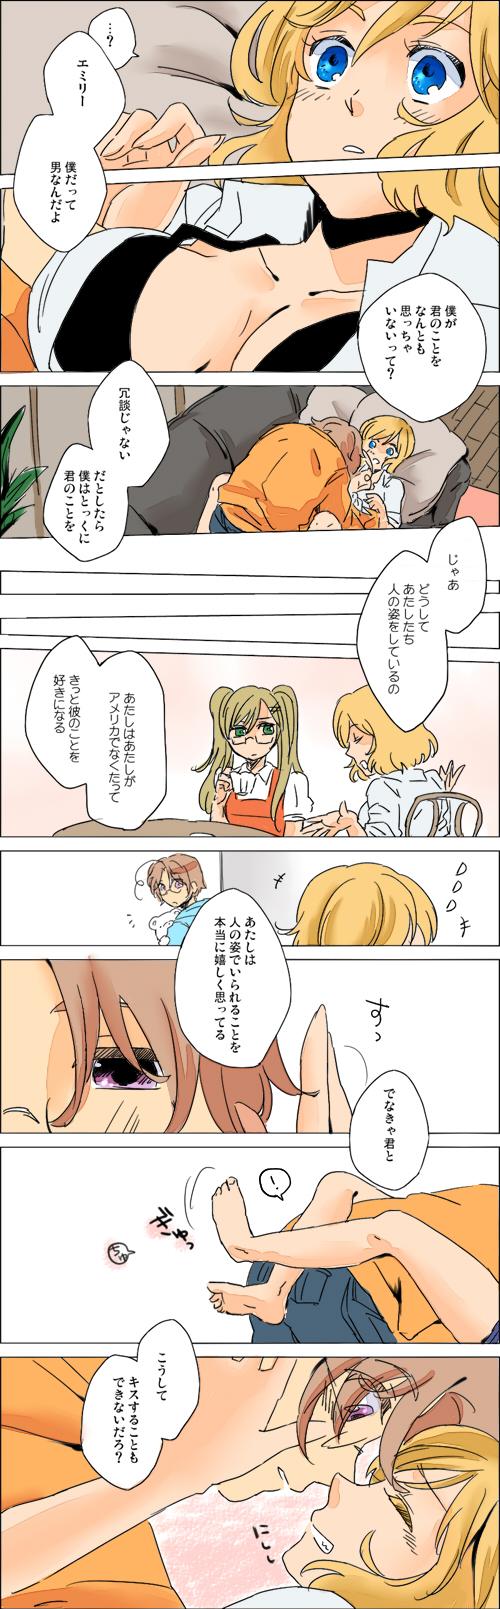 Tags: Anime, Kiyomura, Axis Powers: Hetalia, United Kingdom (Female), Canada, Kumajirou, United States (Female), Pixiv, Nyotalia, Comic, AmeCan